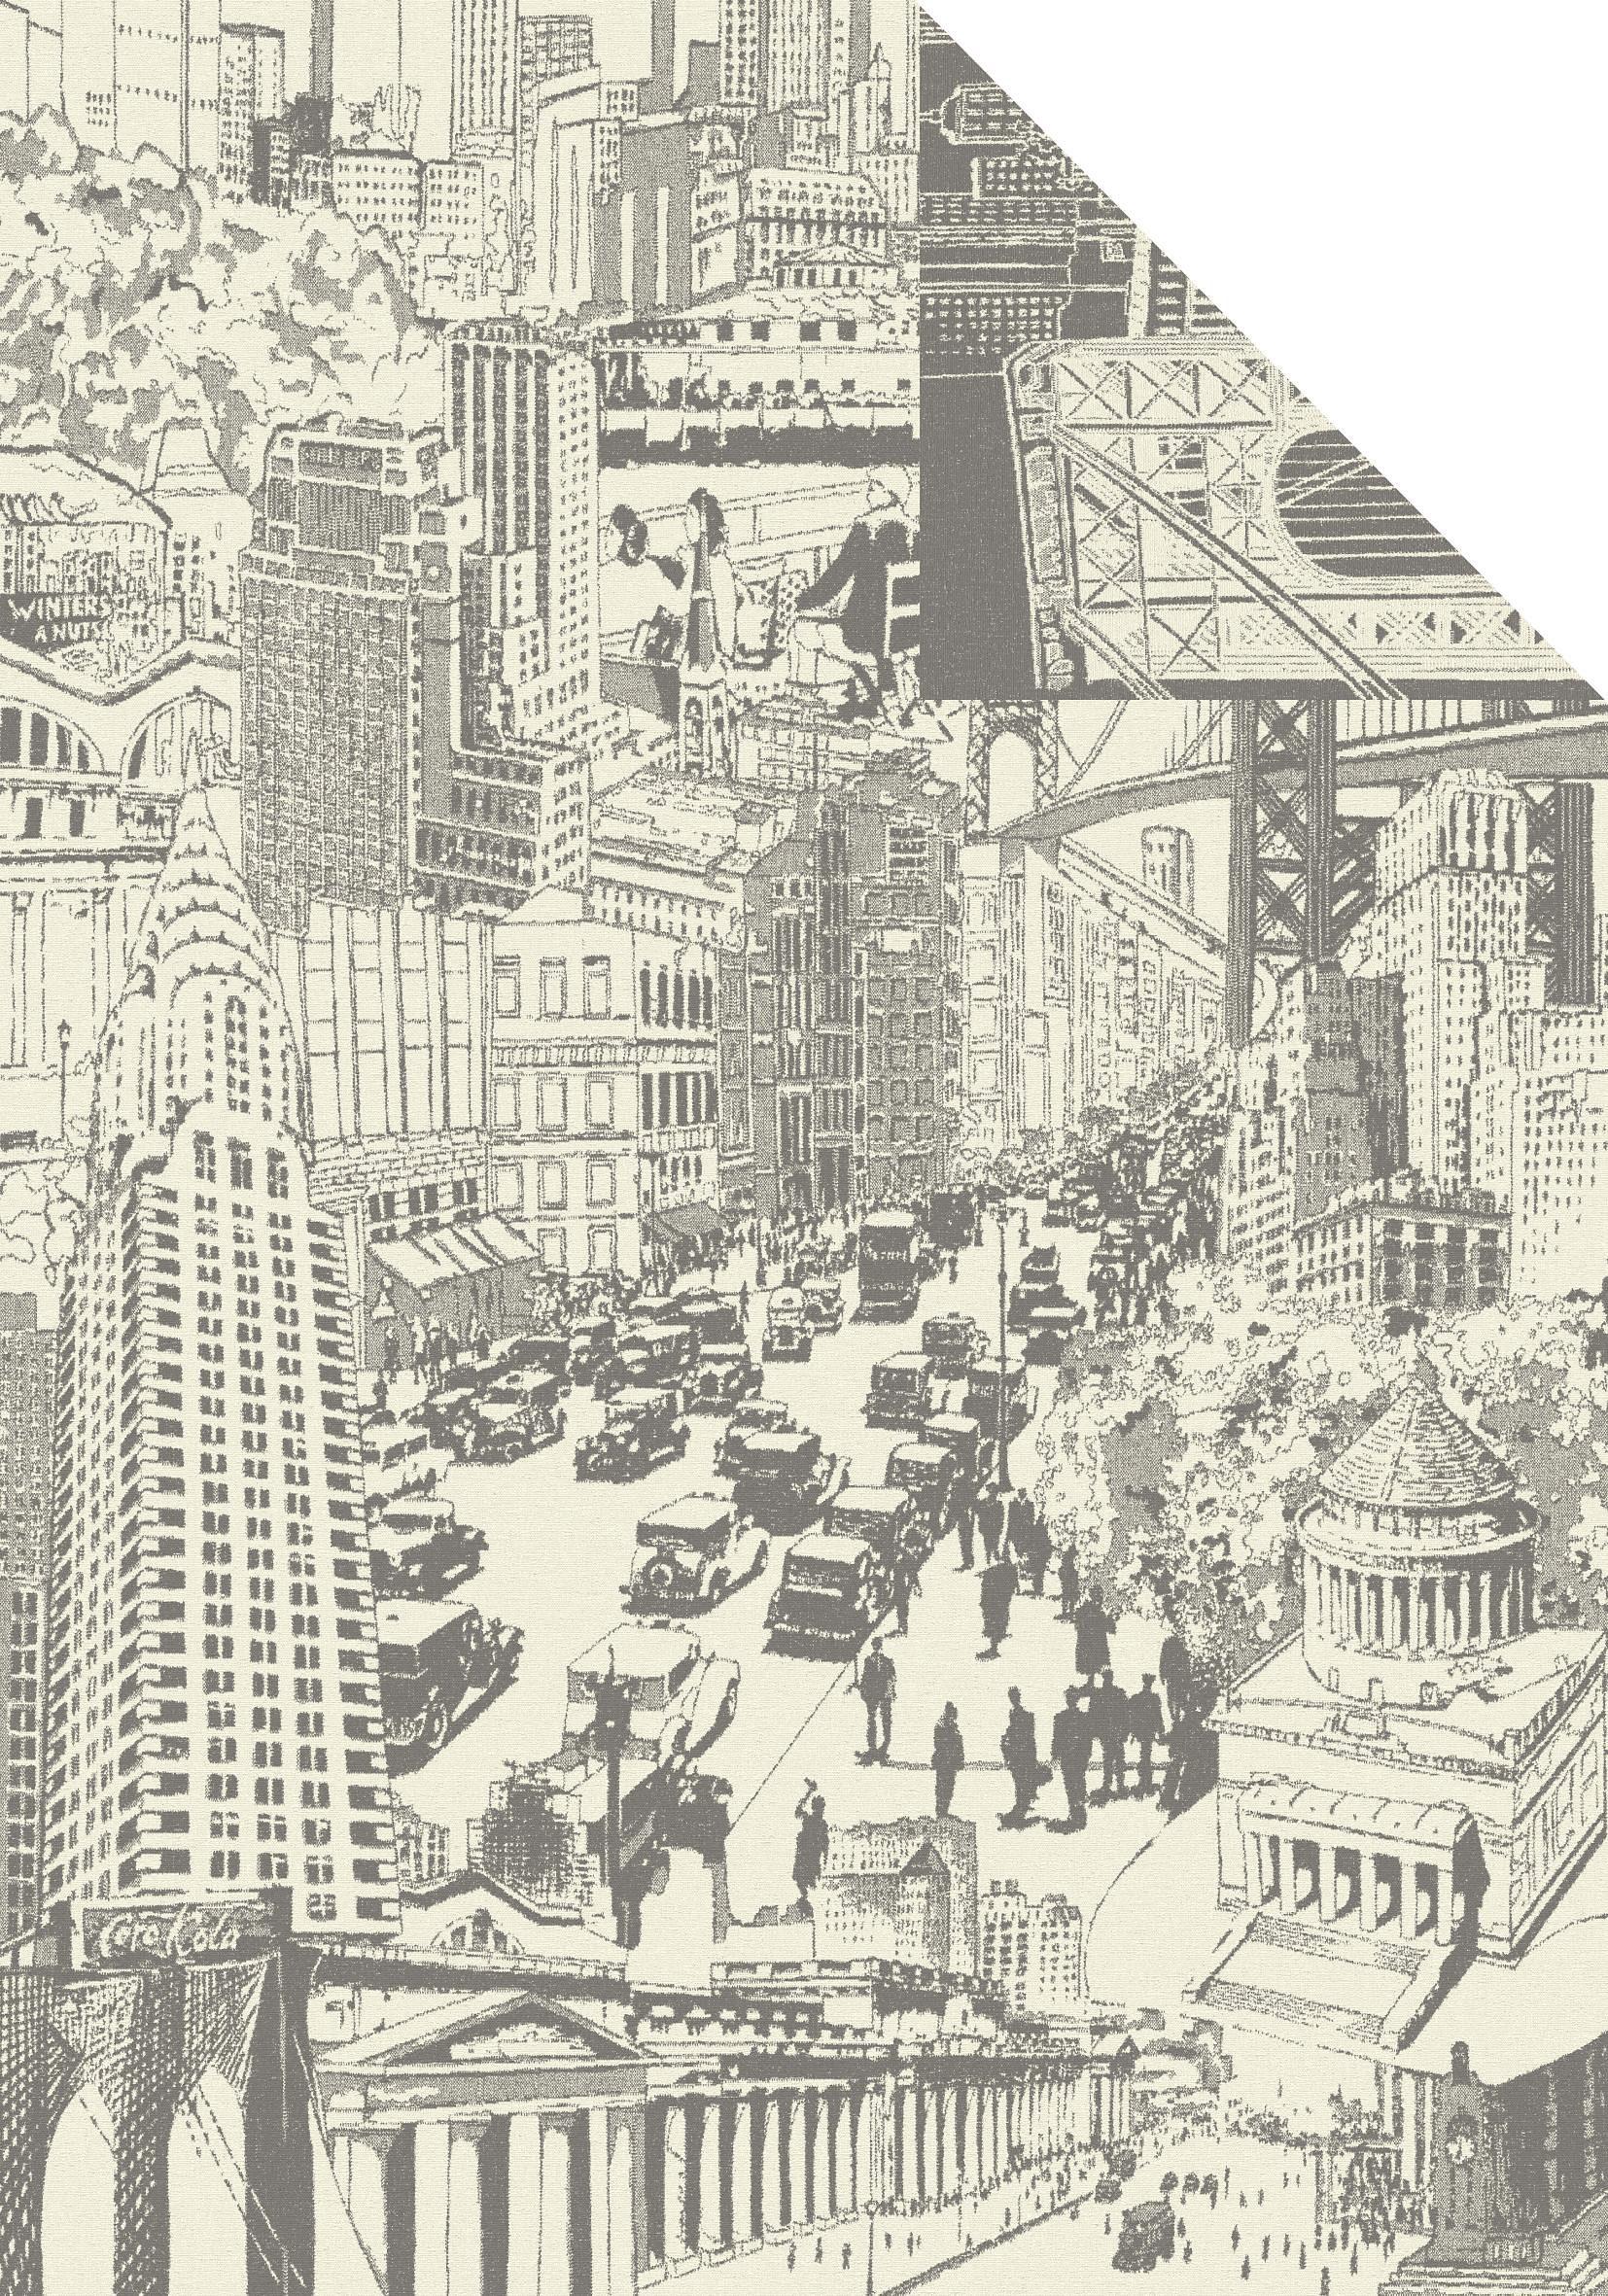 Wohndecke, Ibena, »City Life«, mit Stadtmotiven